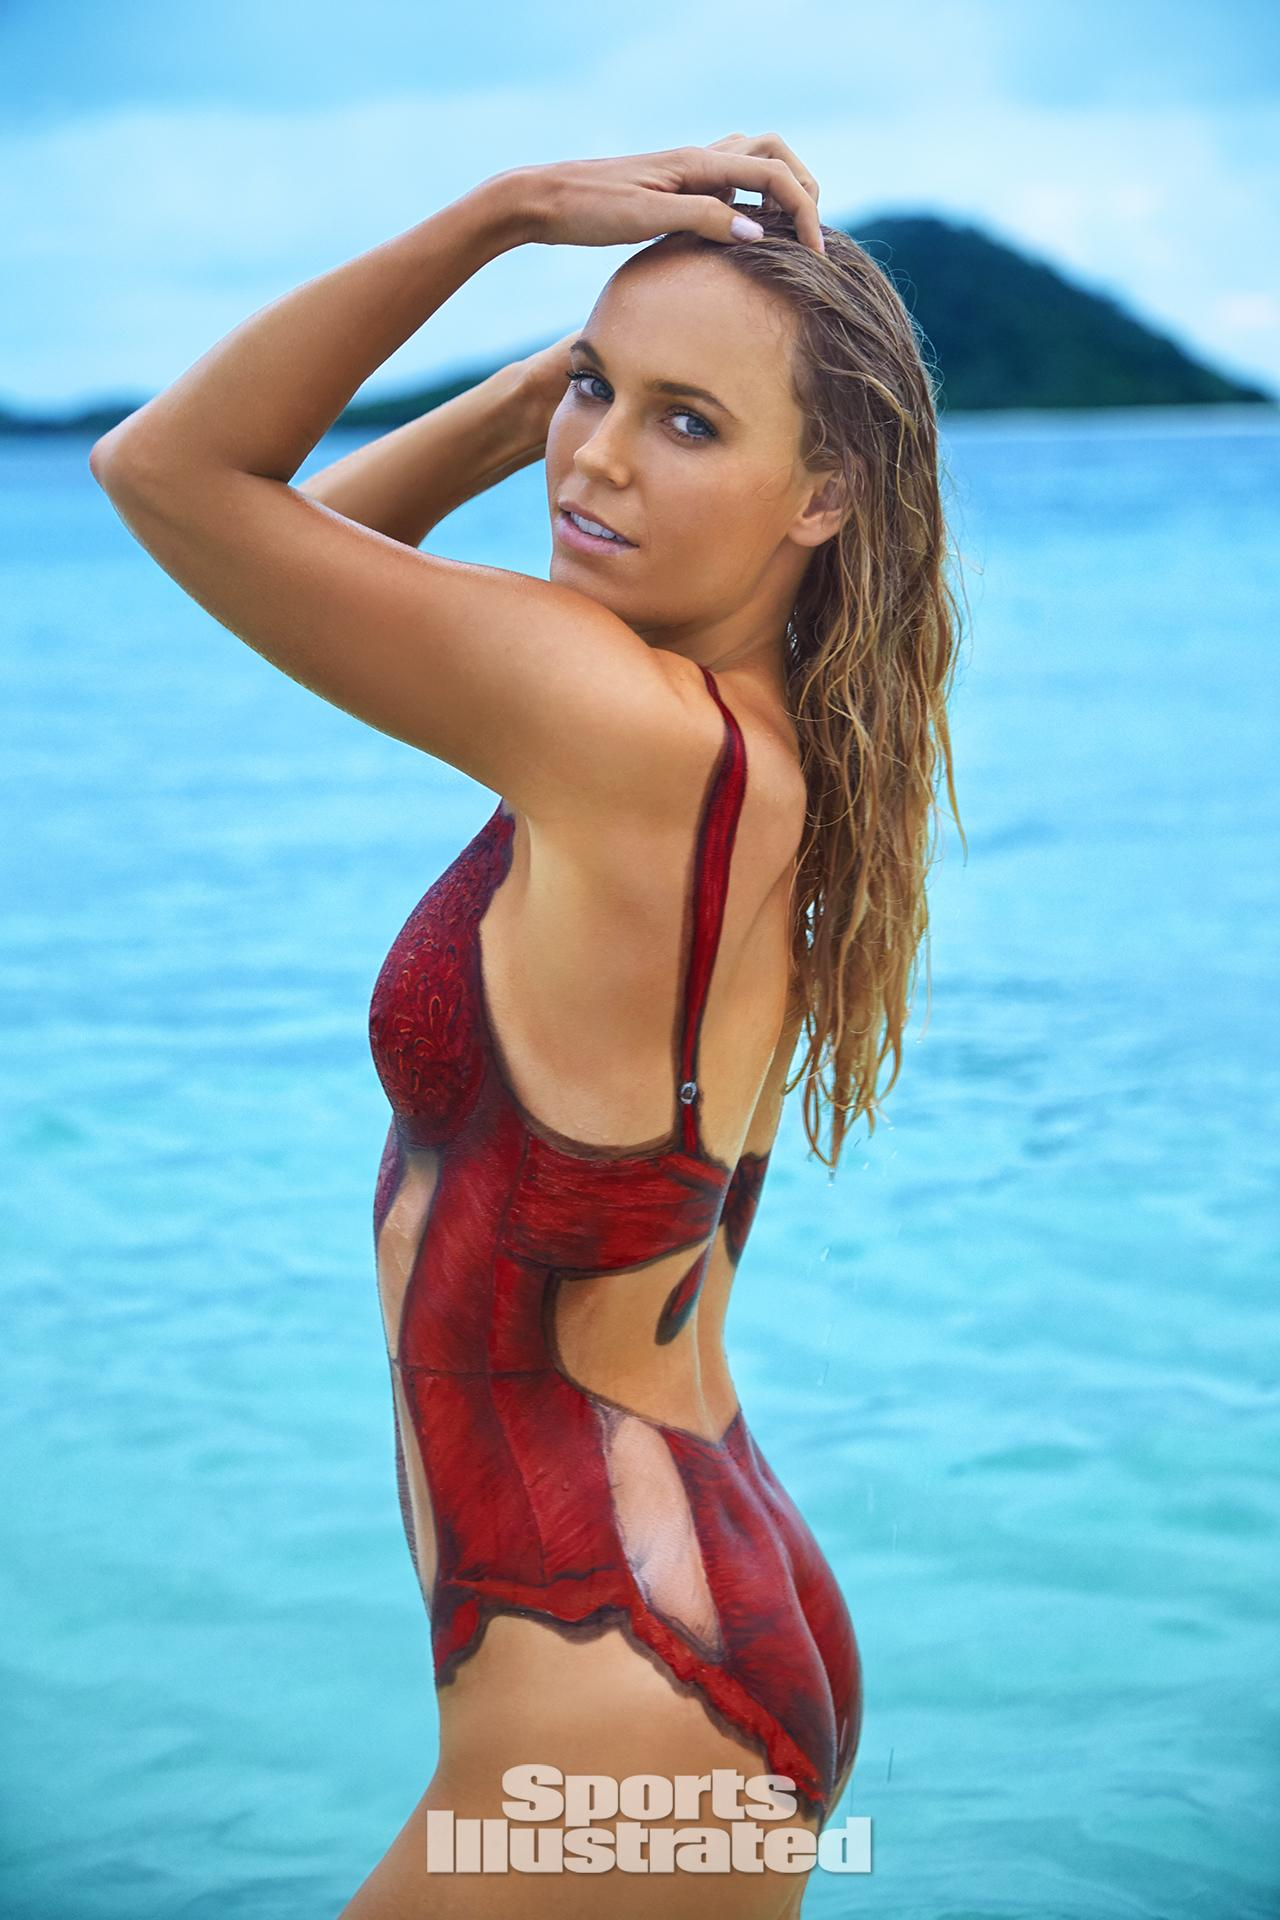 caroline wozniacki swimsuit body paint photos sports illustrated